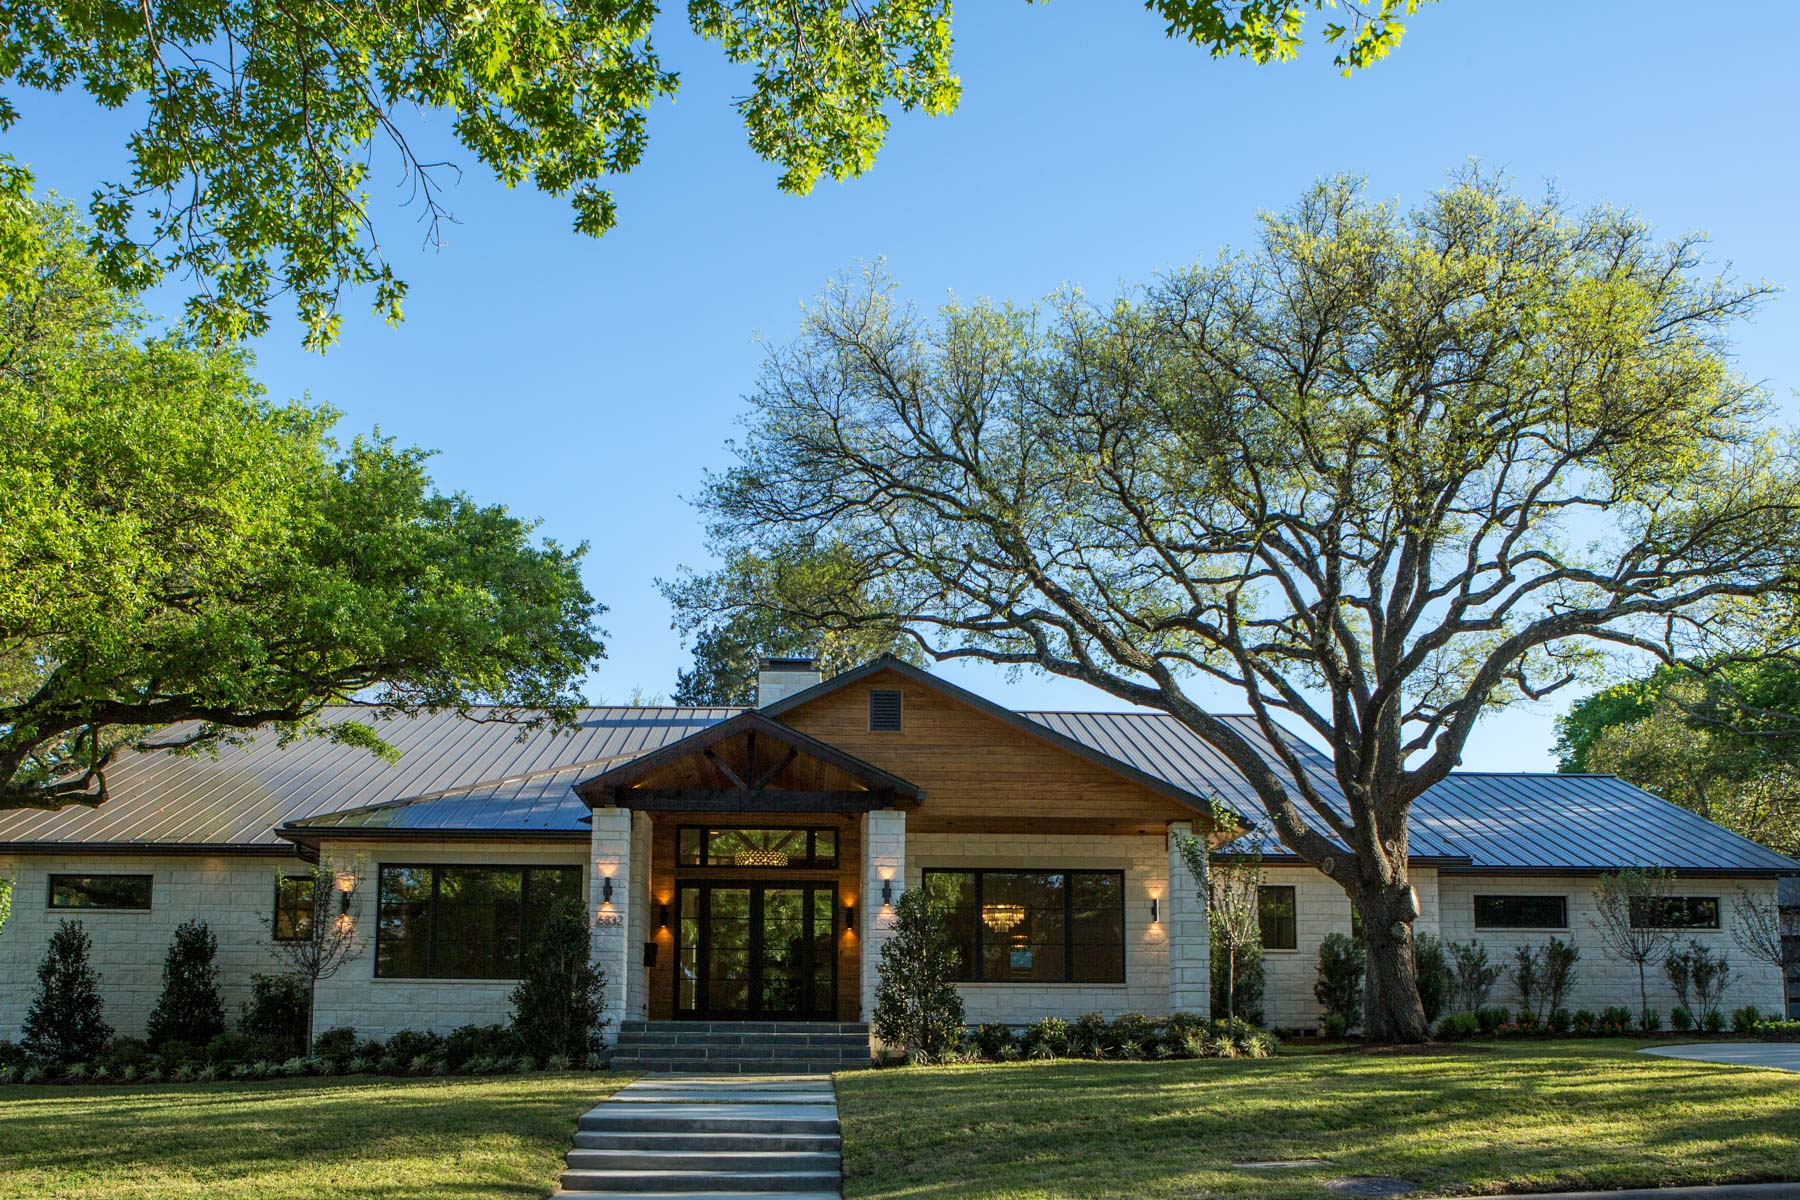 Single Family Home for Sale at 6832 Westlake Ave, Dallas Dallas, Texas, 75214 United States